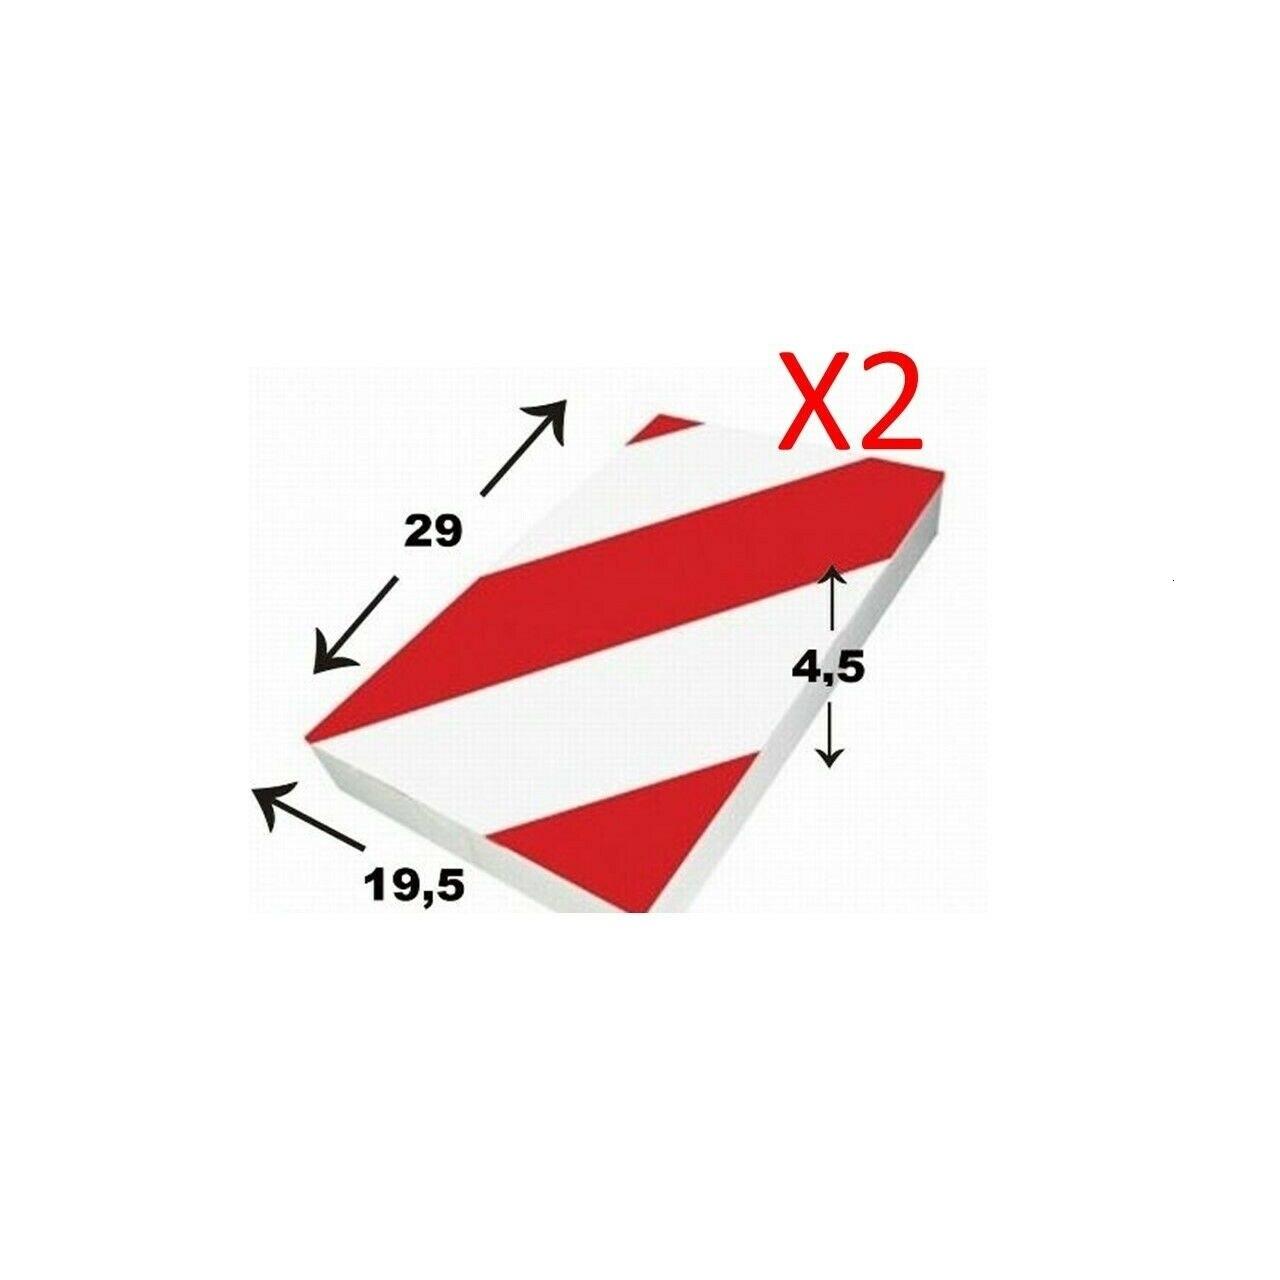 Protector de Pared X 2, Garaje ANTIGOLPES para APARCAR, 29X19,5X4,5